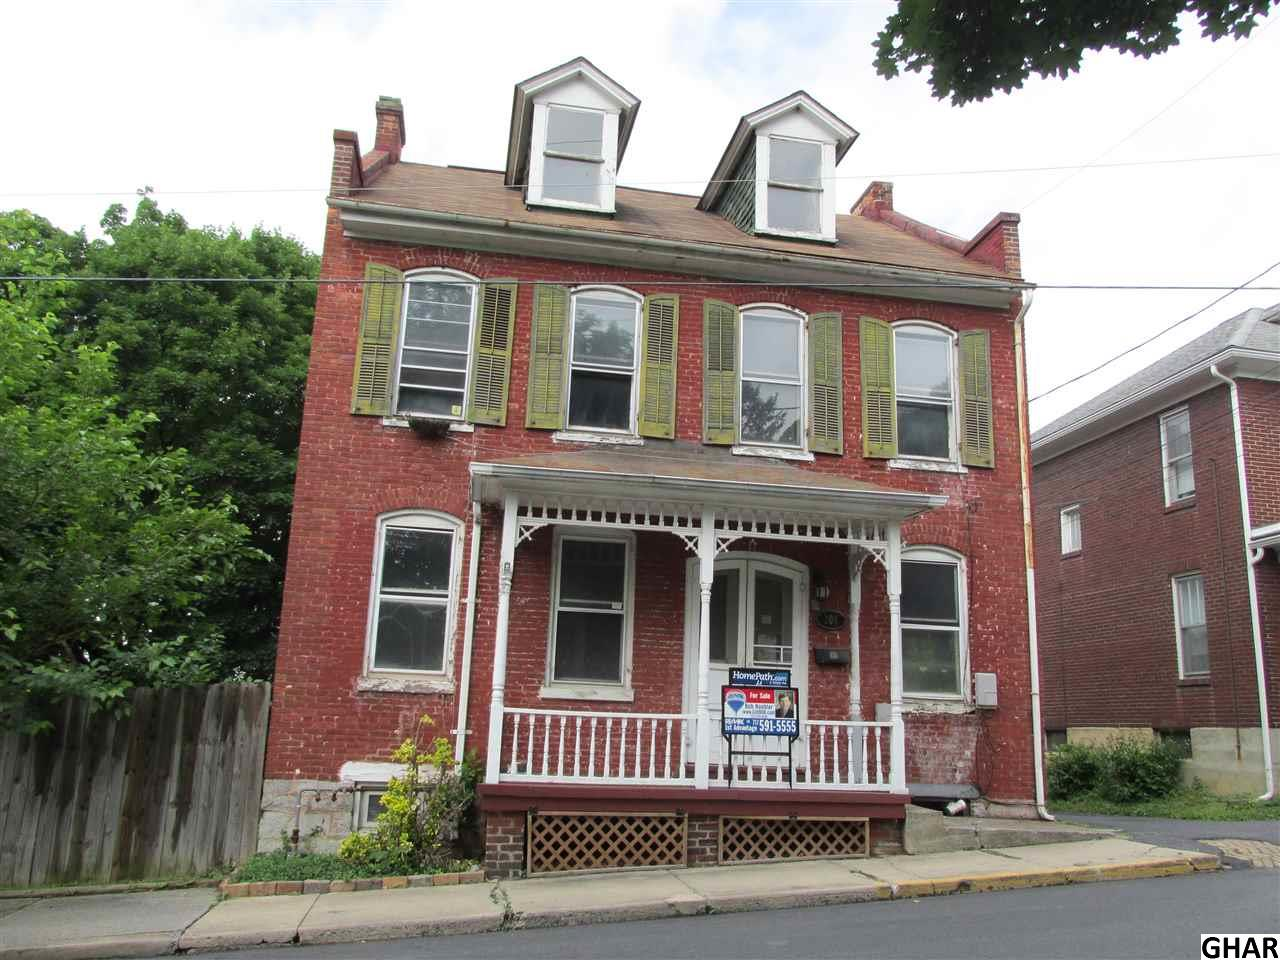 206 N Wayne St, Lewistown, PA 17044